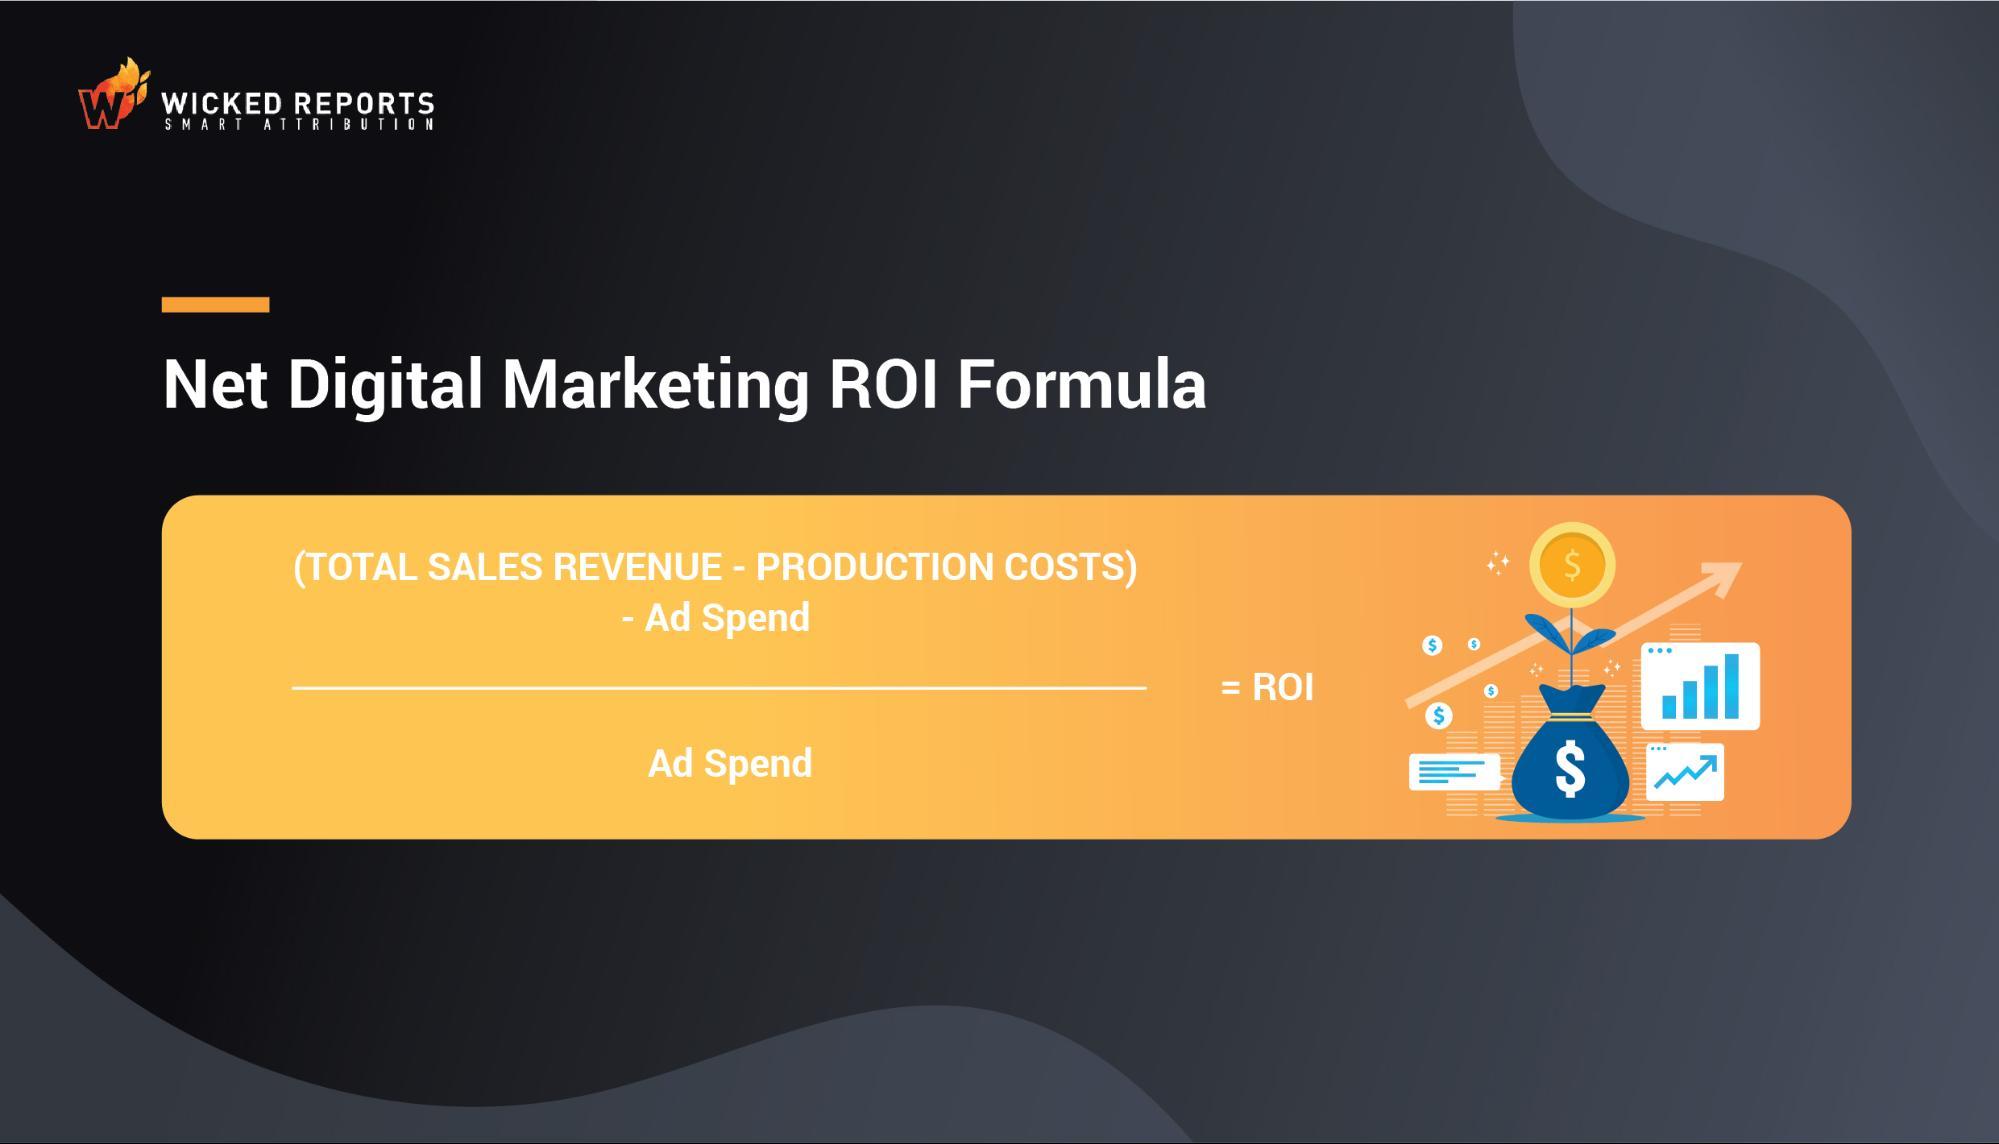 net digital marketing ROI formula